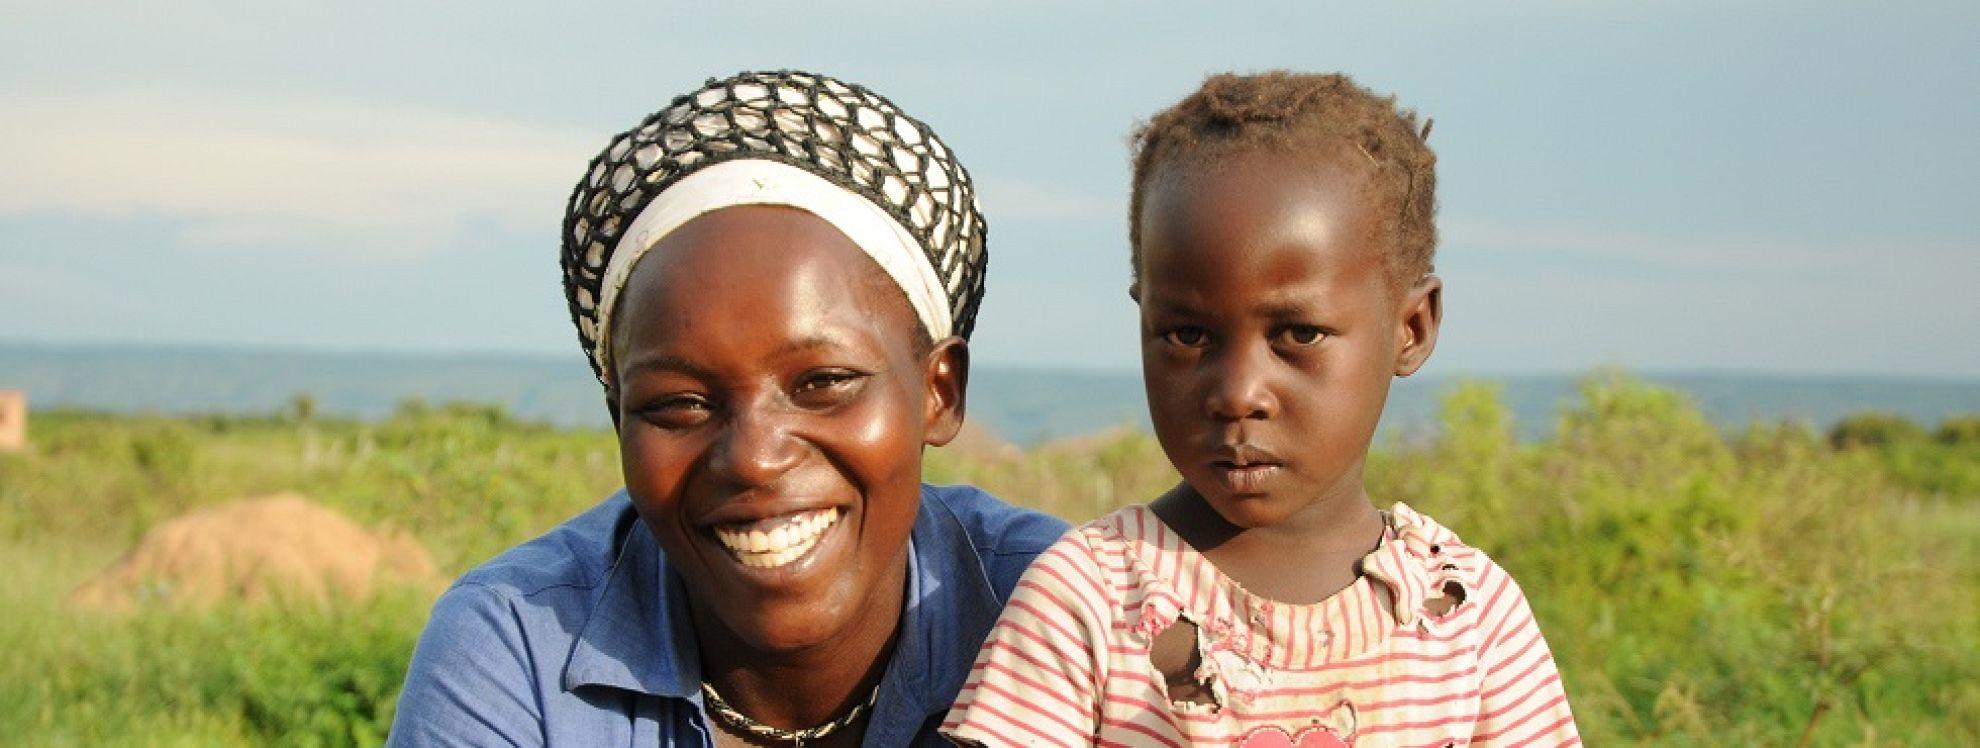 Latest News Malaria consortium welcomes five year 3 billion commitment to fight malaria